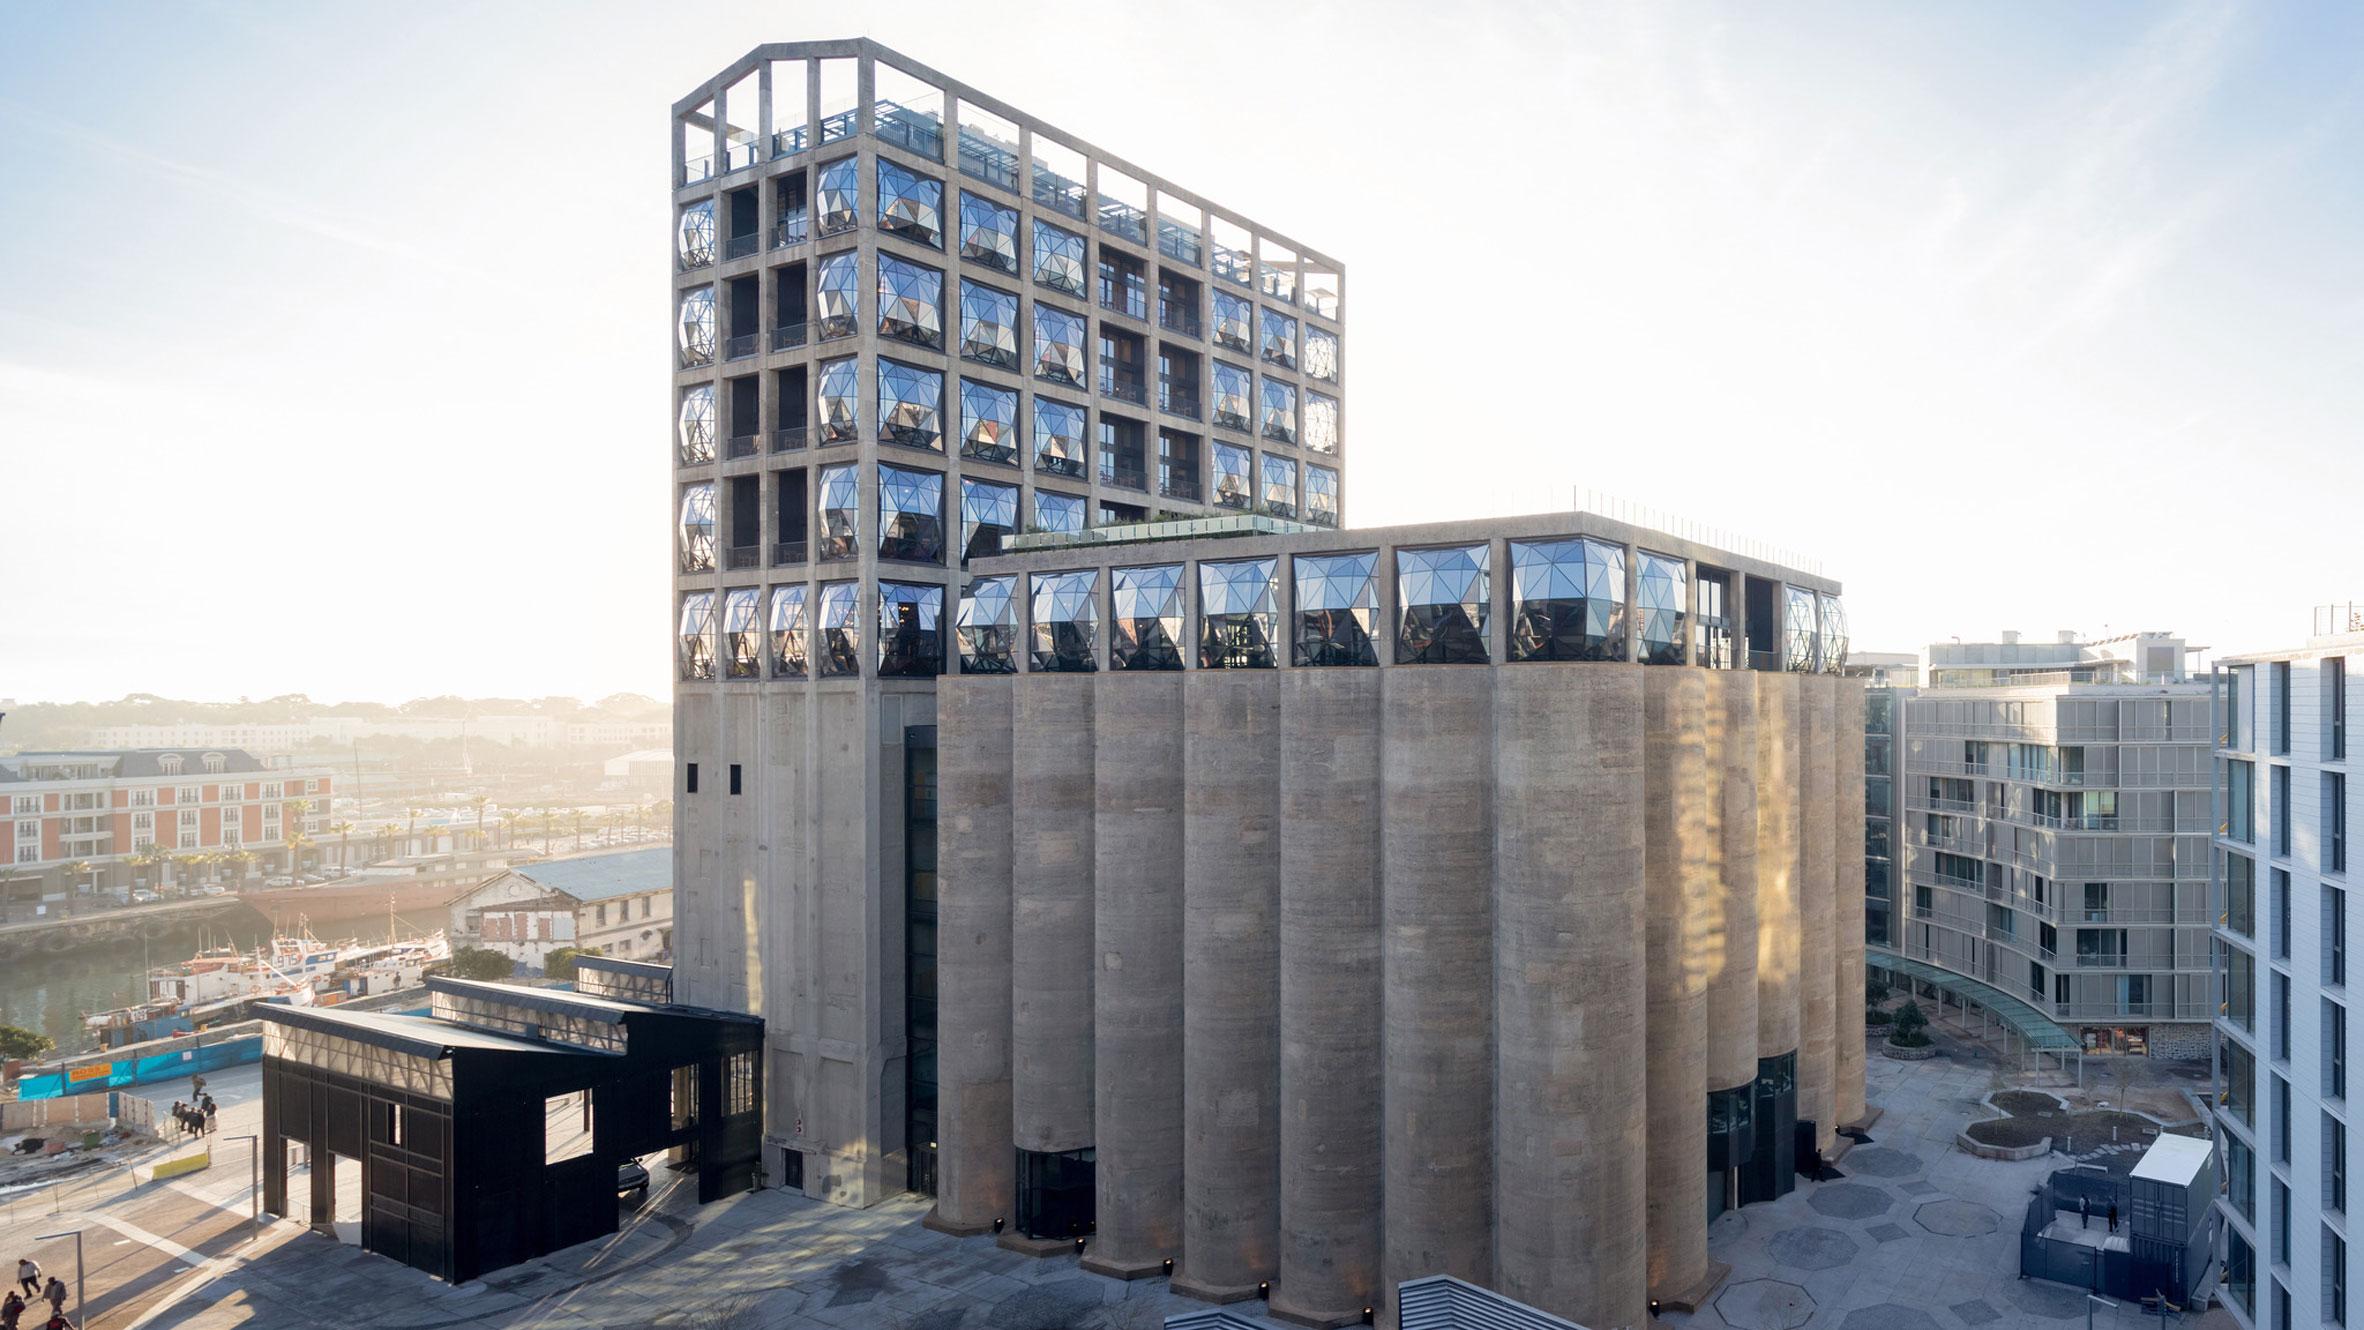 Zeitz MOCAA, Cape Town, South Africa, by Heatherwick Studio